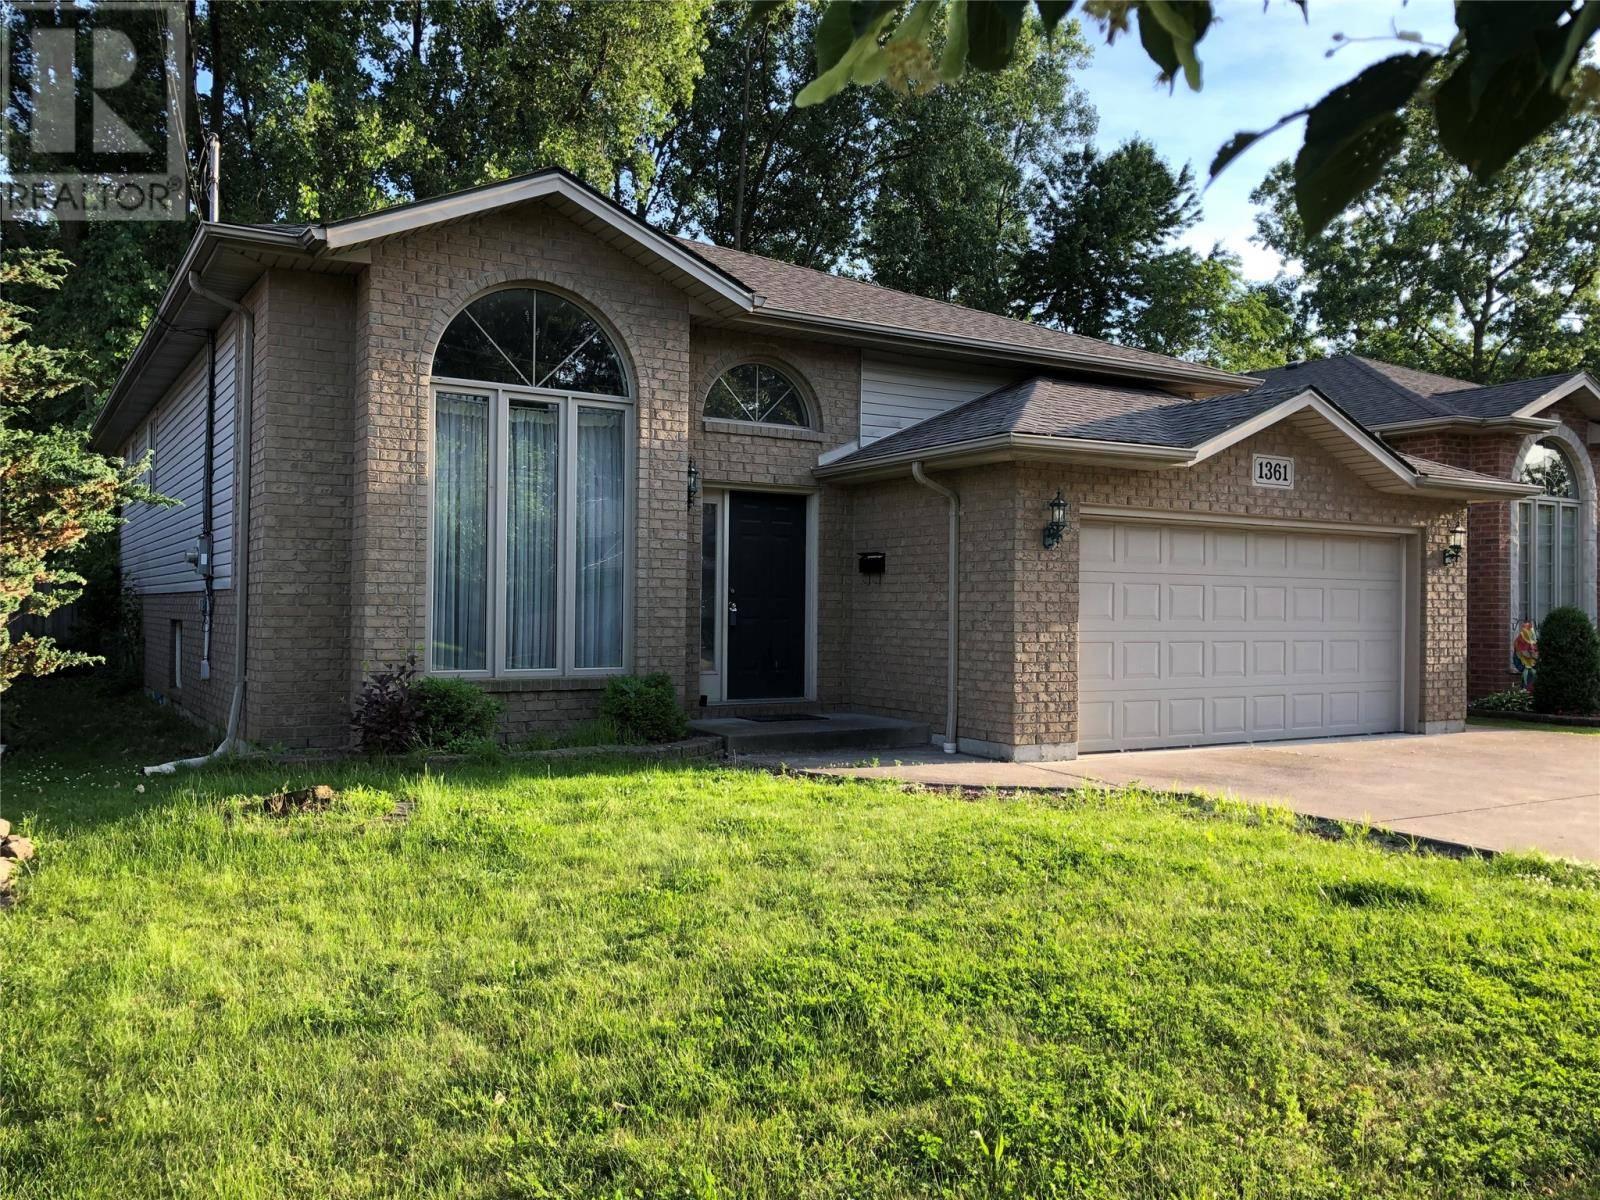 House for sale at 1361 Armanda St Windsor Ontario - MLS: 19020833